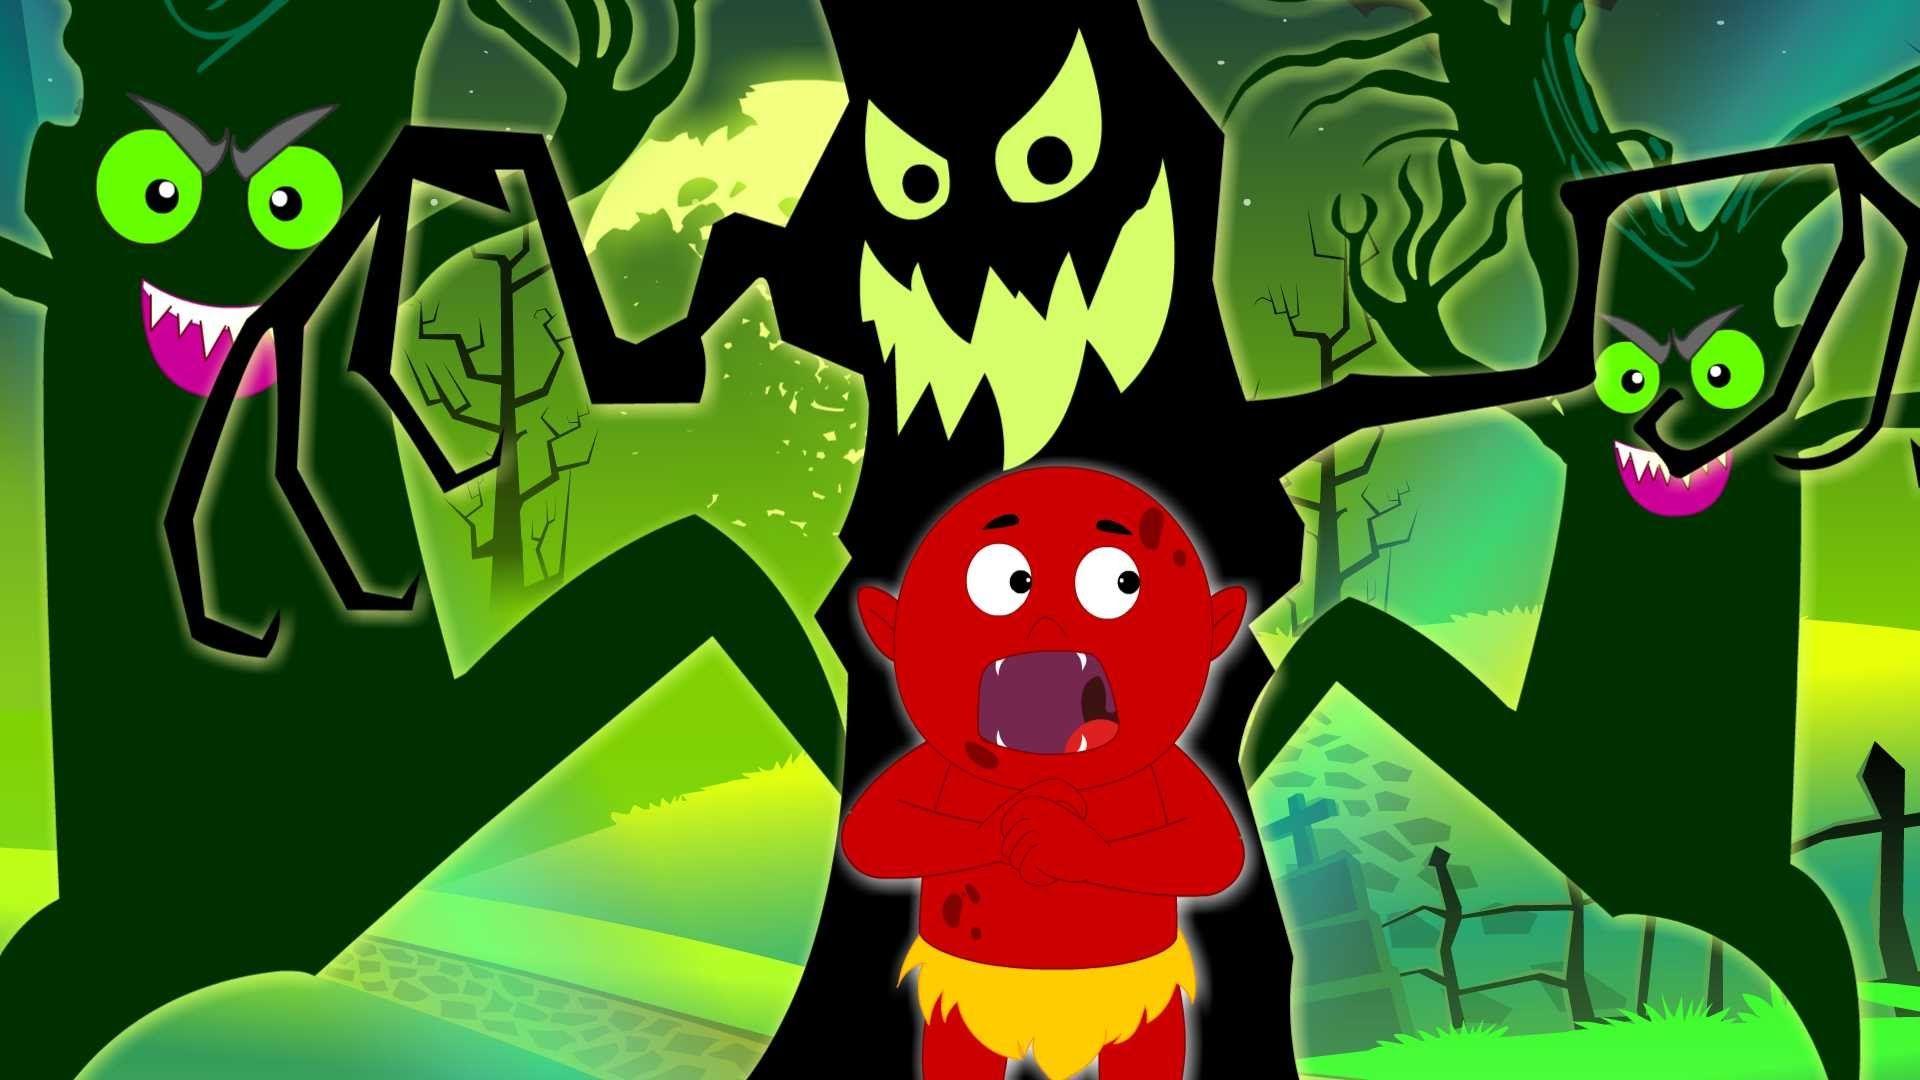 Scary Woods Original Songs For Kids Scary Nursery Rhymes